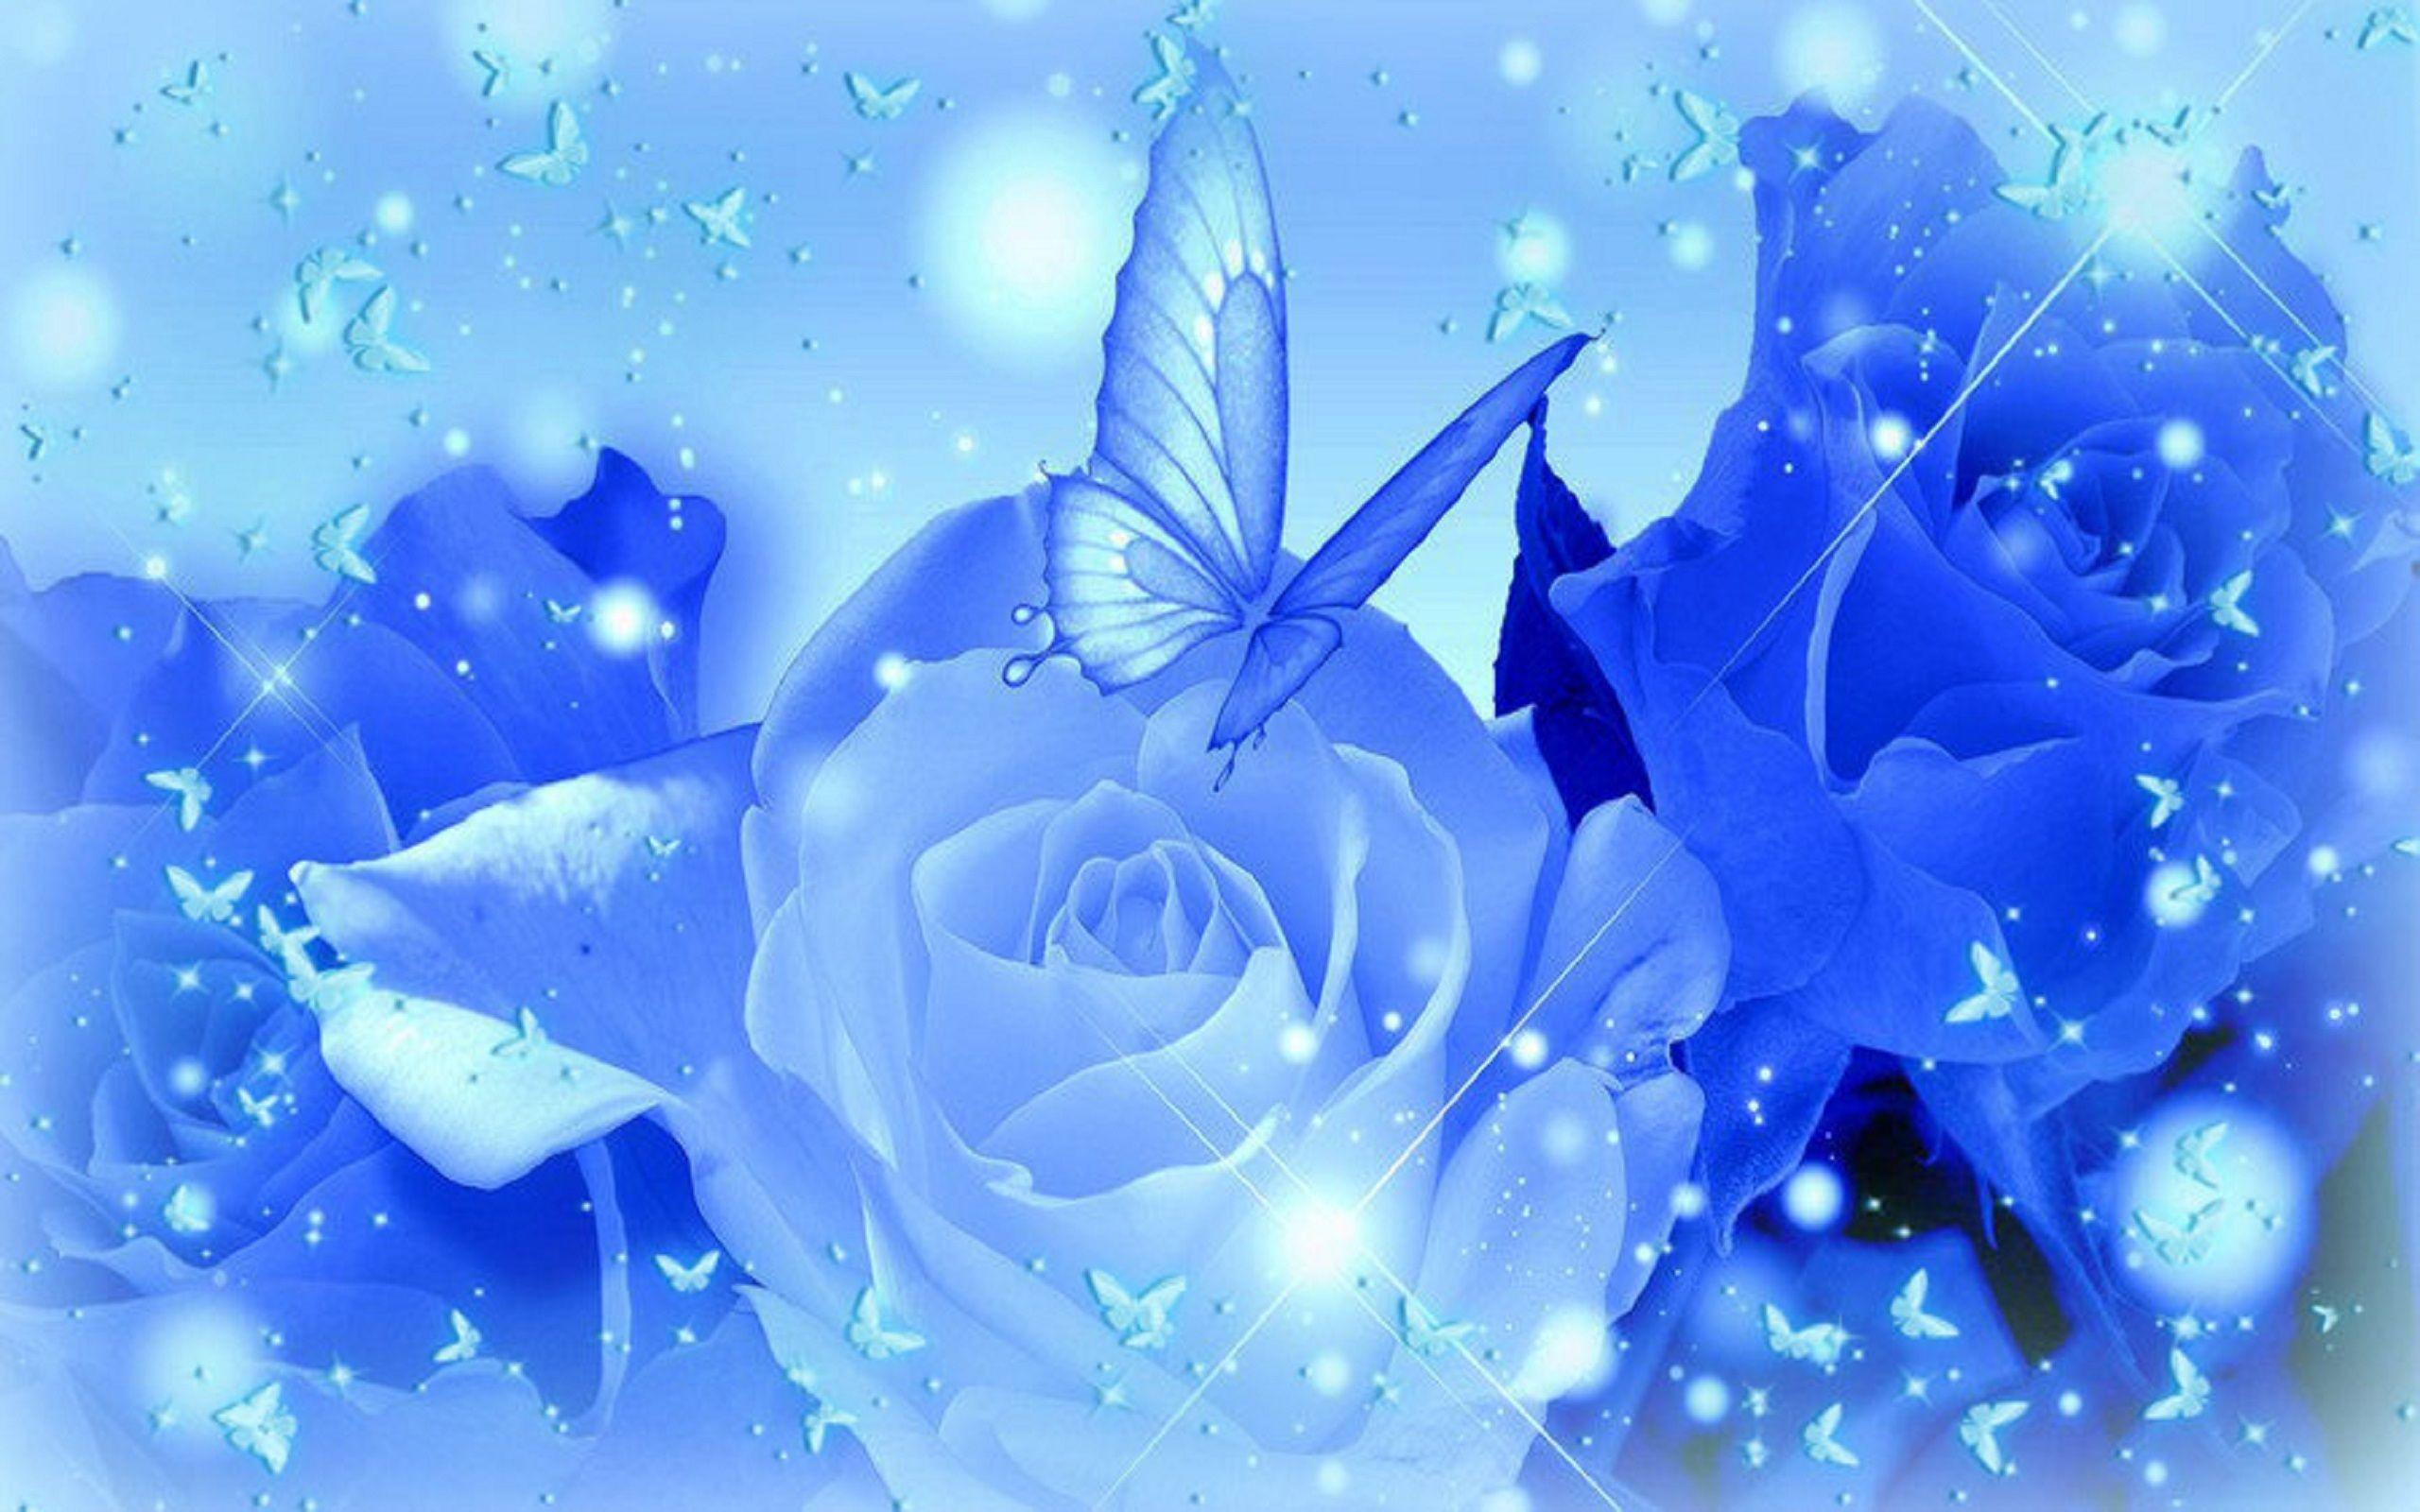 blue rose desktop wallpapers roses and flowers